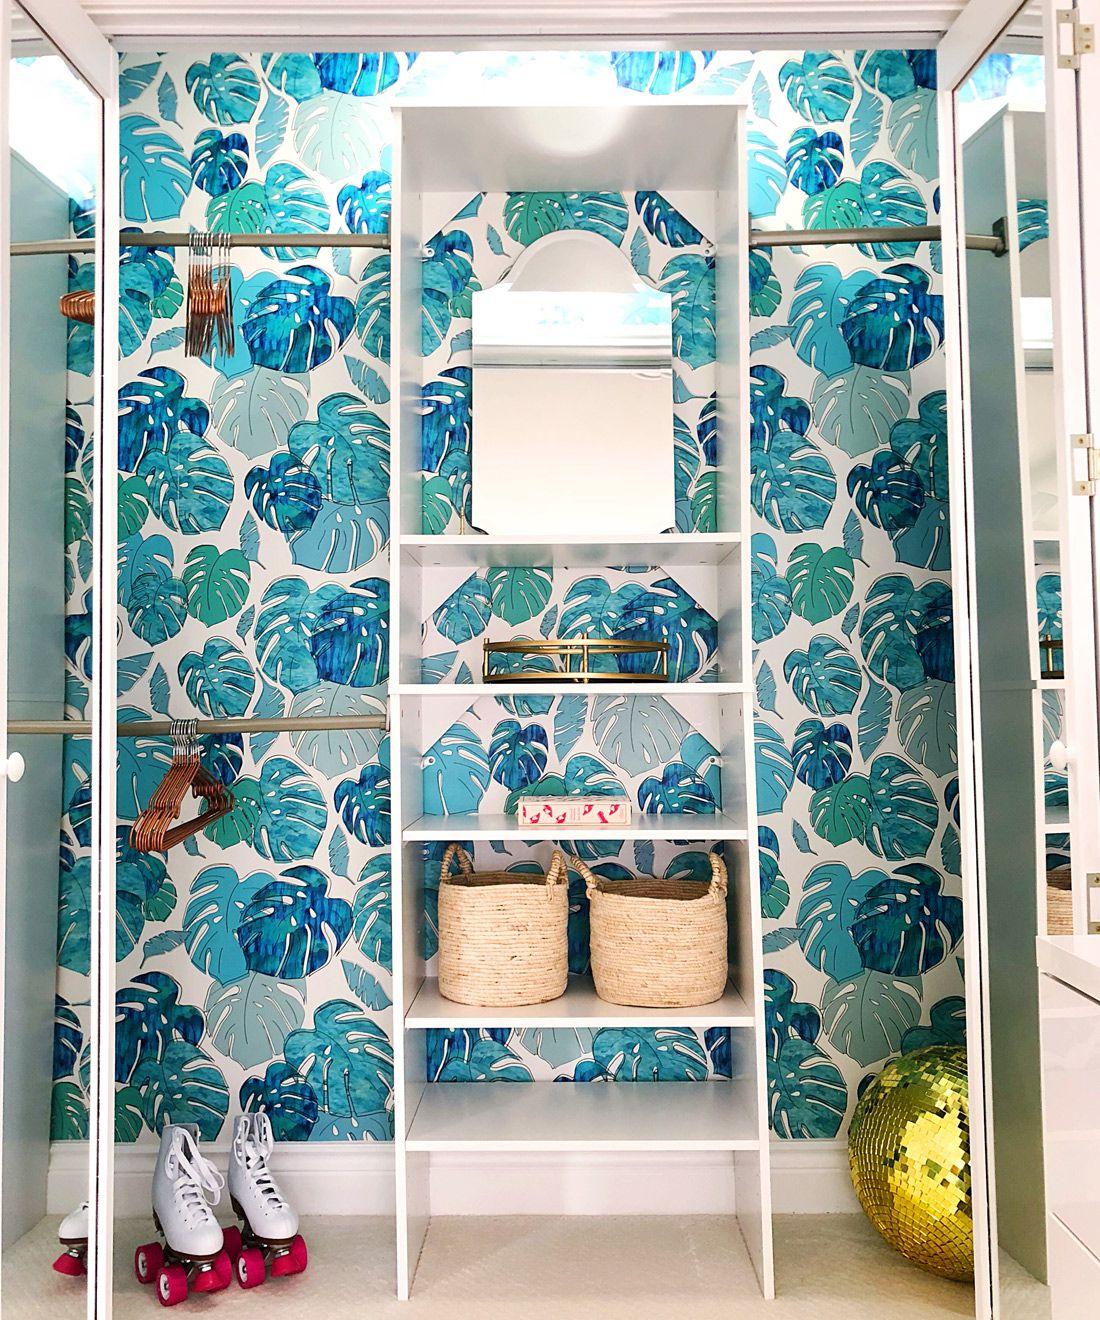 Tropicale Wallpaper • Tropical Wallpaper • Tween Bedroom • Turquoise Wallpaper • Kelly Lee •One Room Challenge